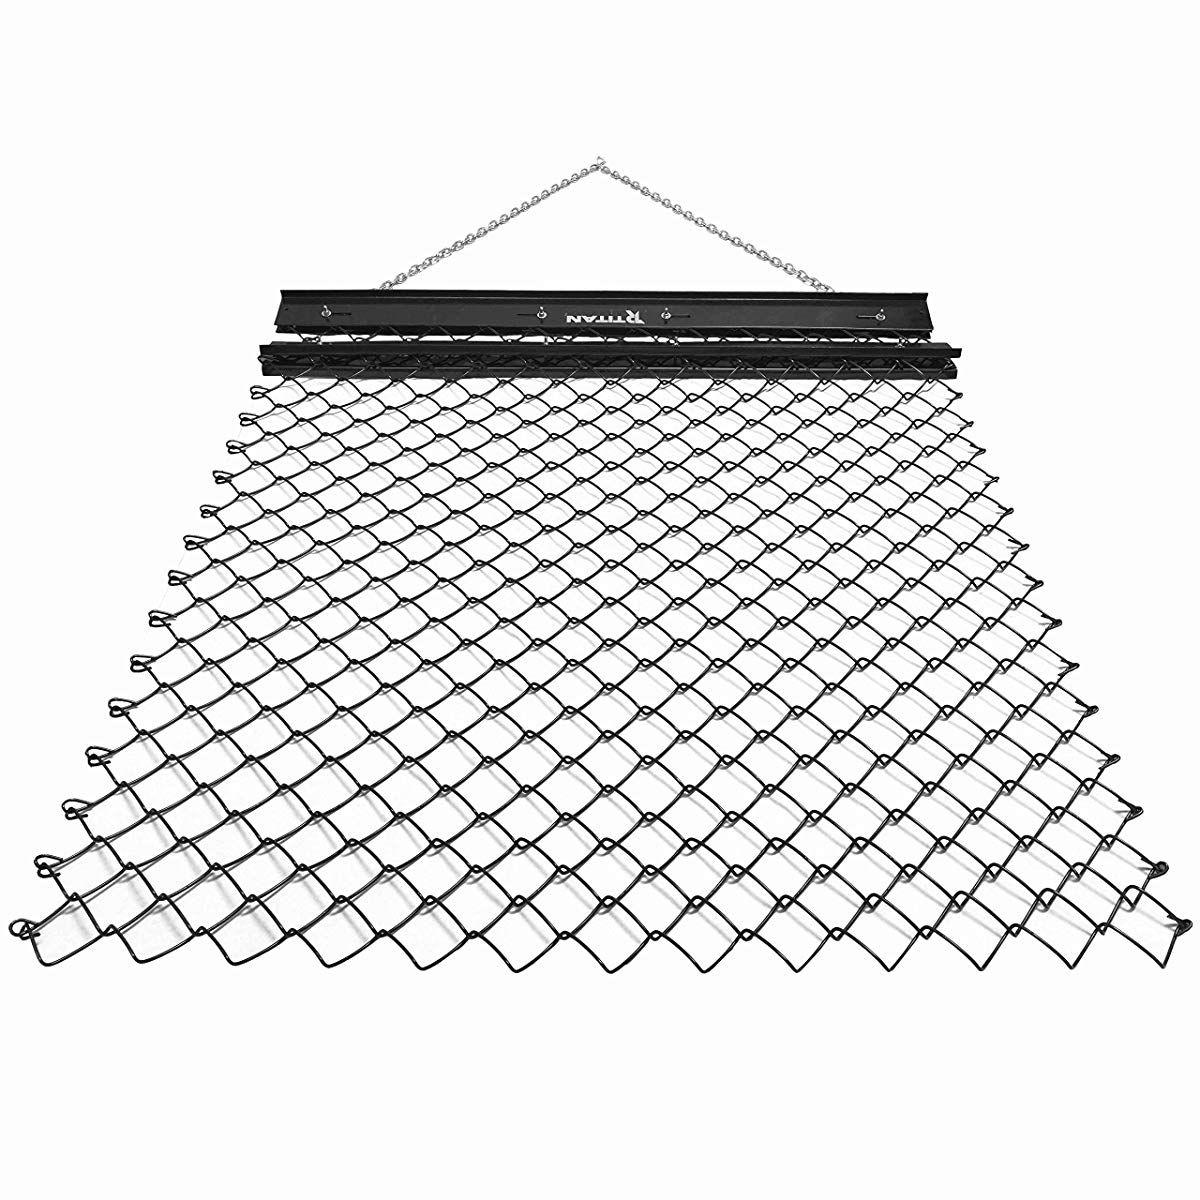 Titan 4 x 5 Drag Harrow Grading Leveling Drag Mat Steel